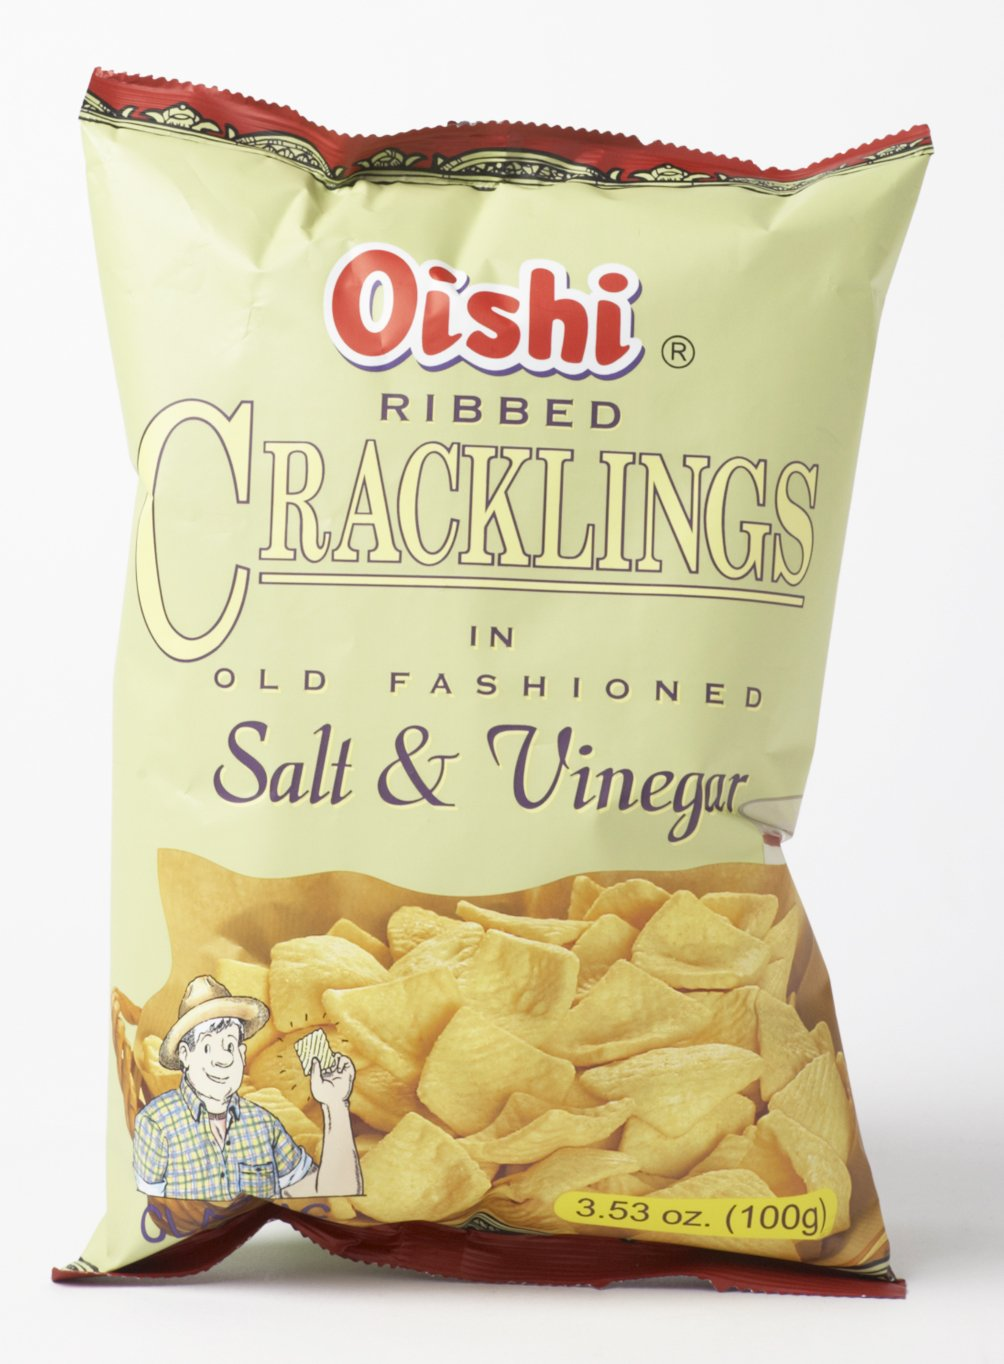 Oishi Ribbed Cracklings Salt and Vinegar 3.53 Oz 100g